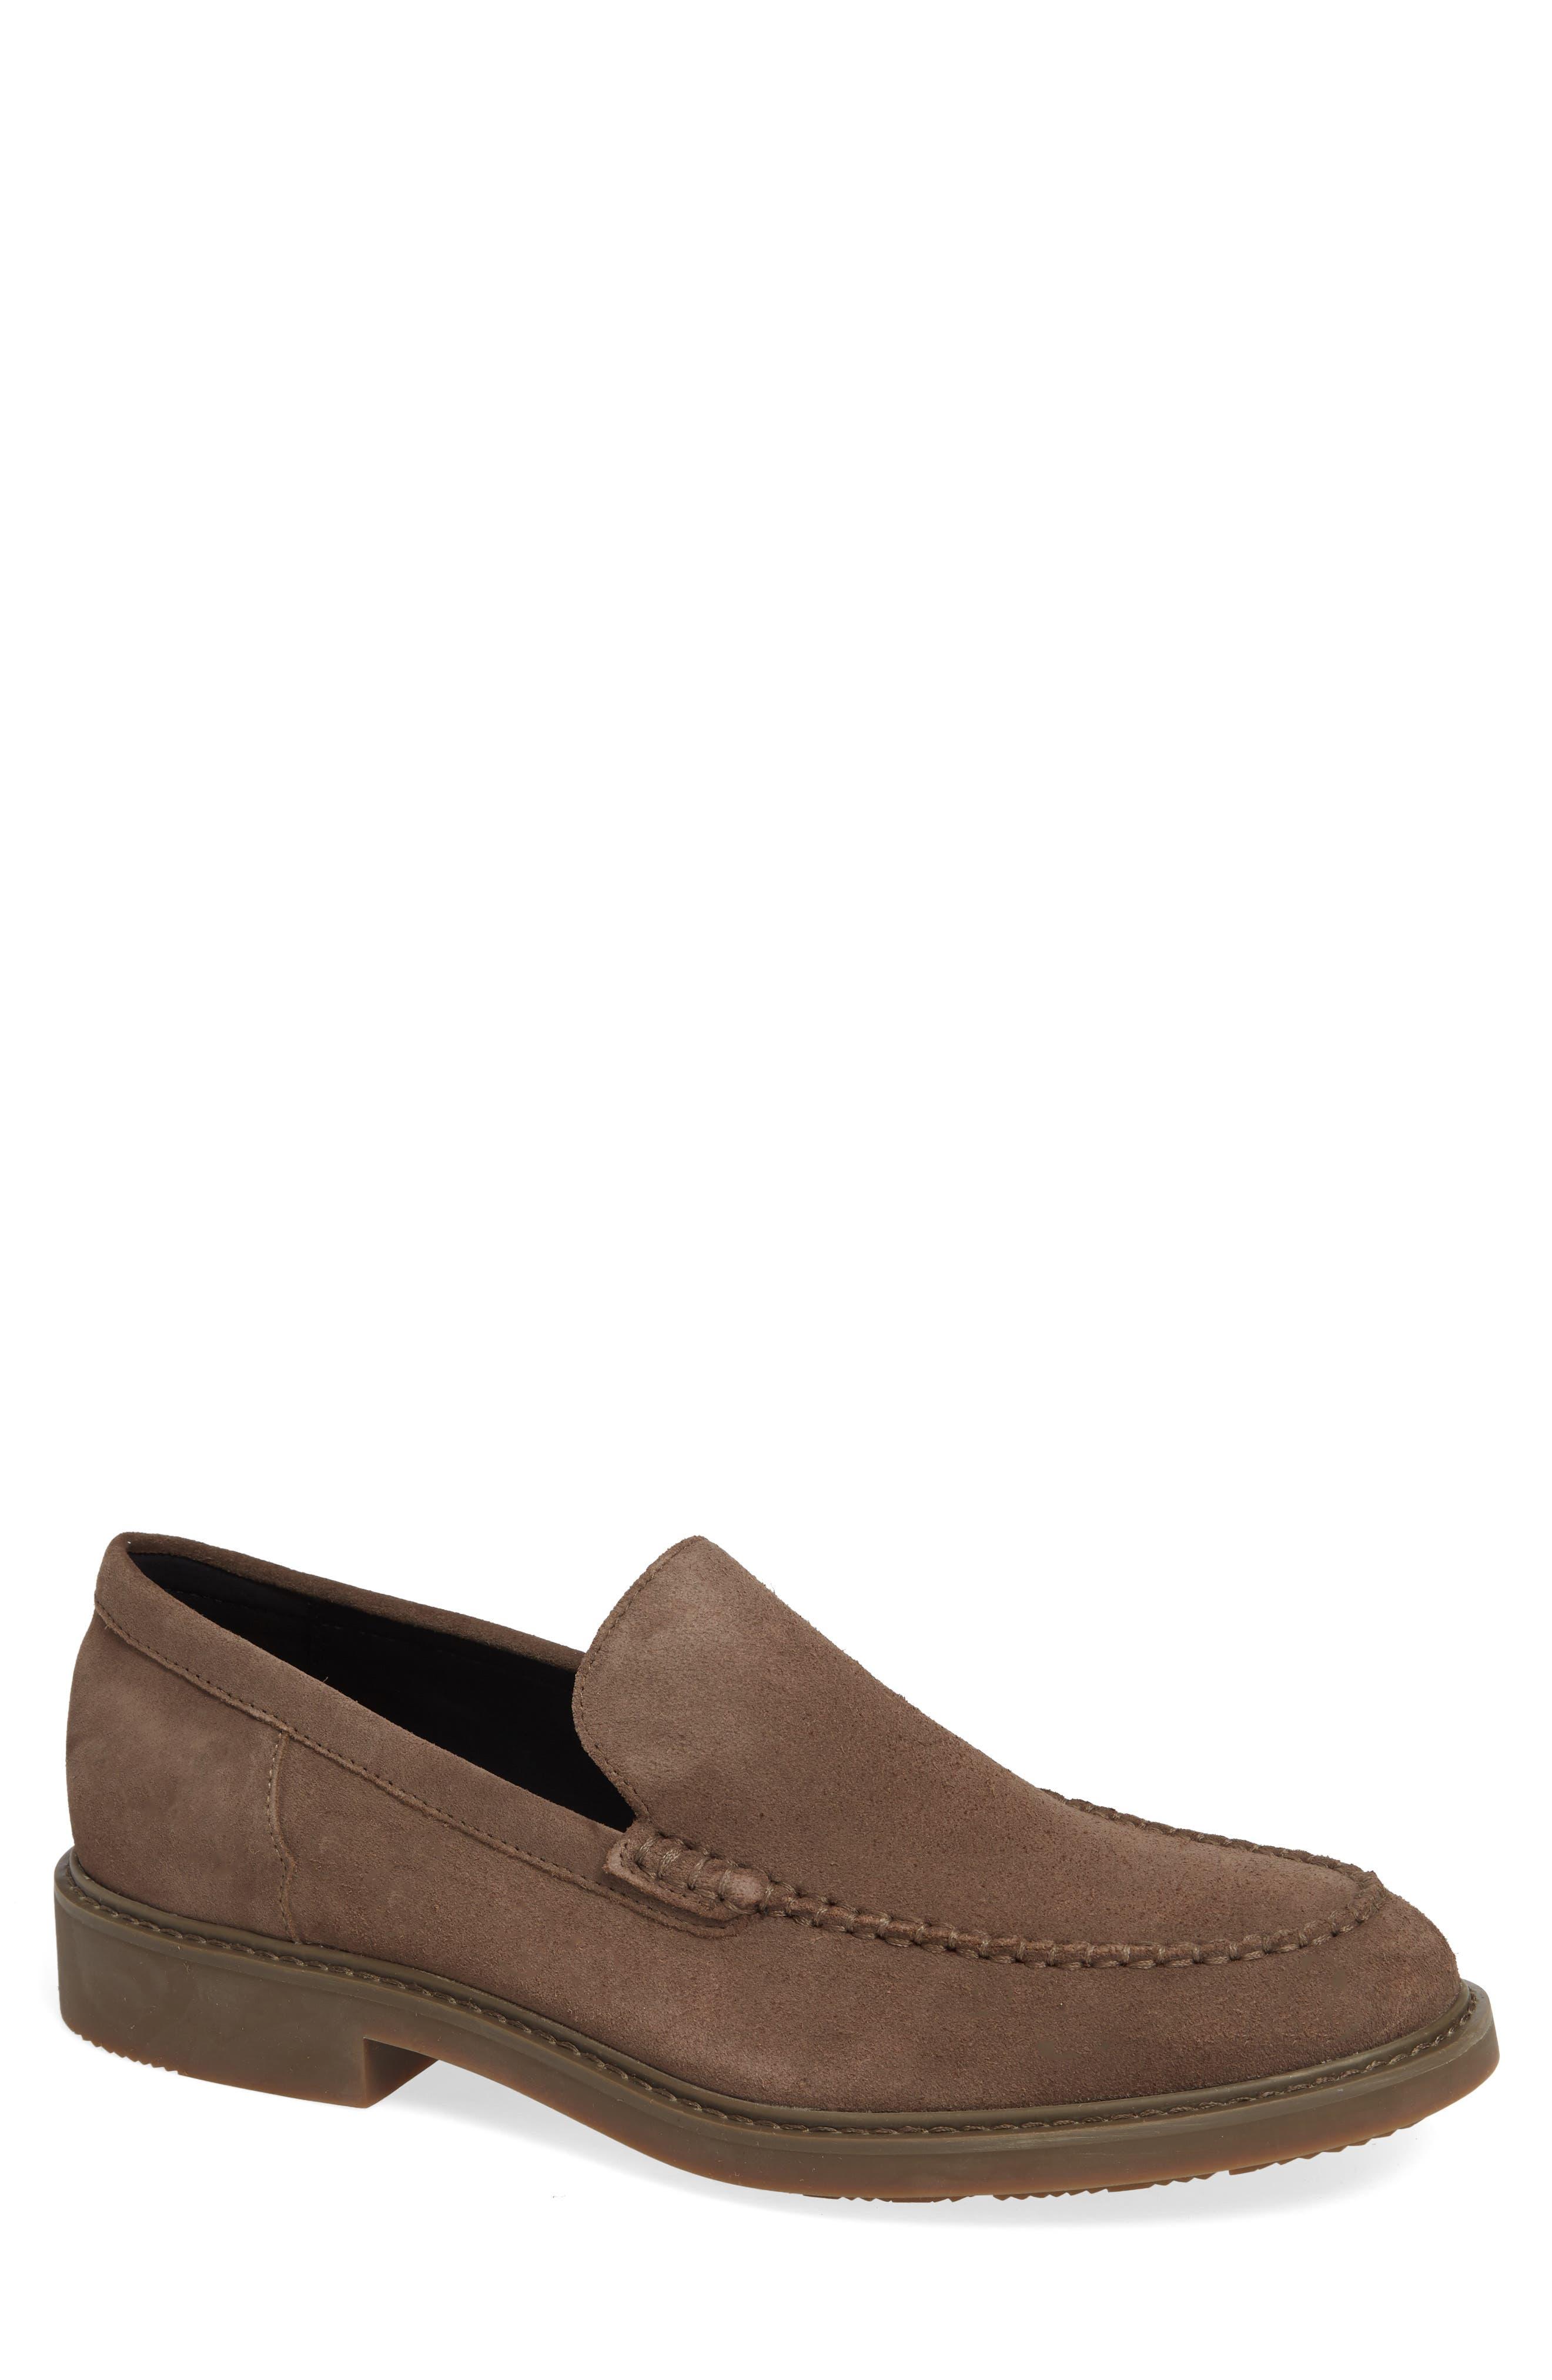 Calvin Klein Vance Apron Toe Loafer